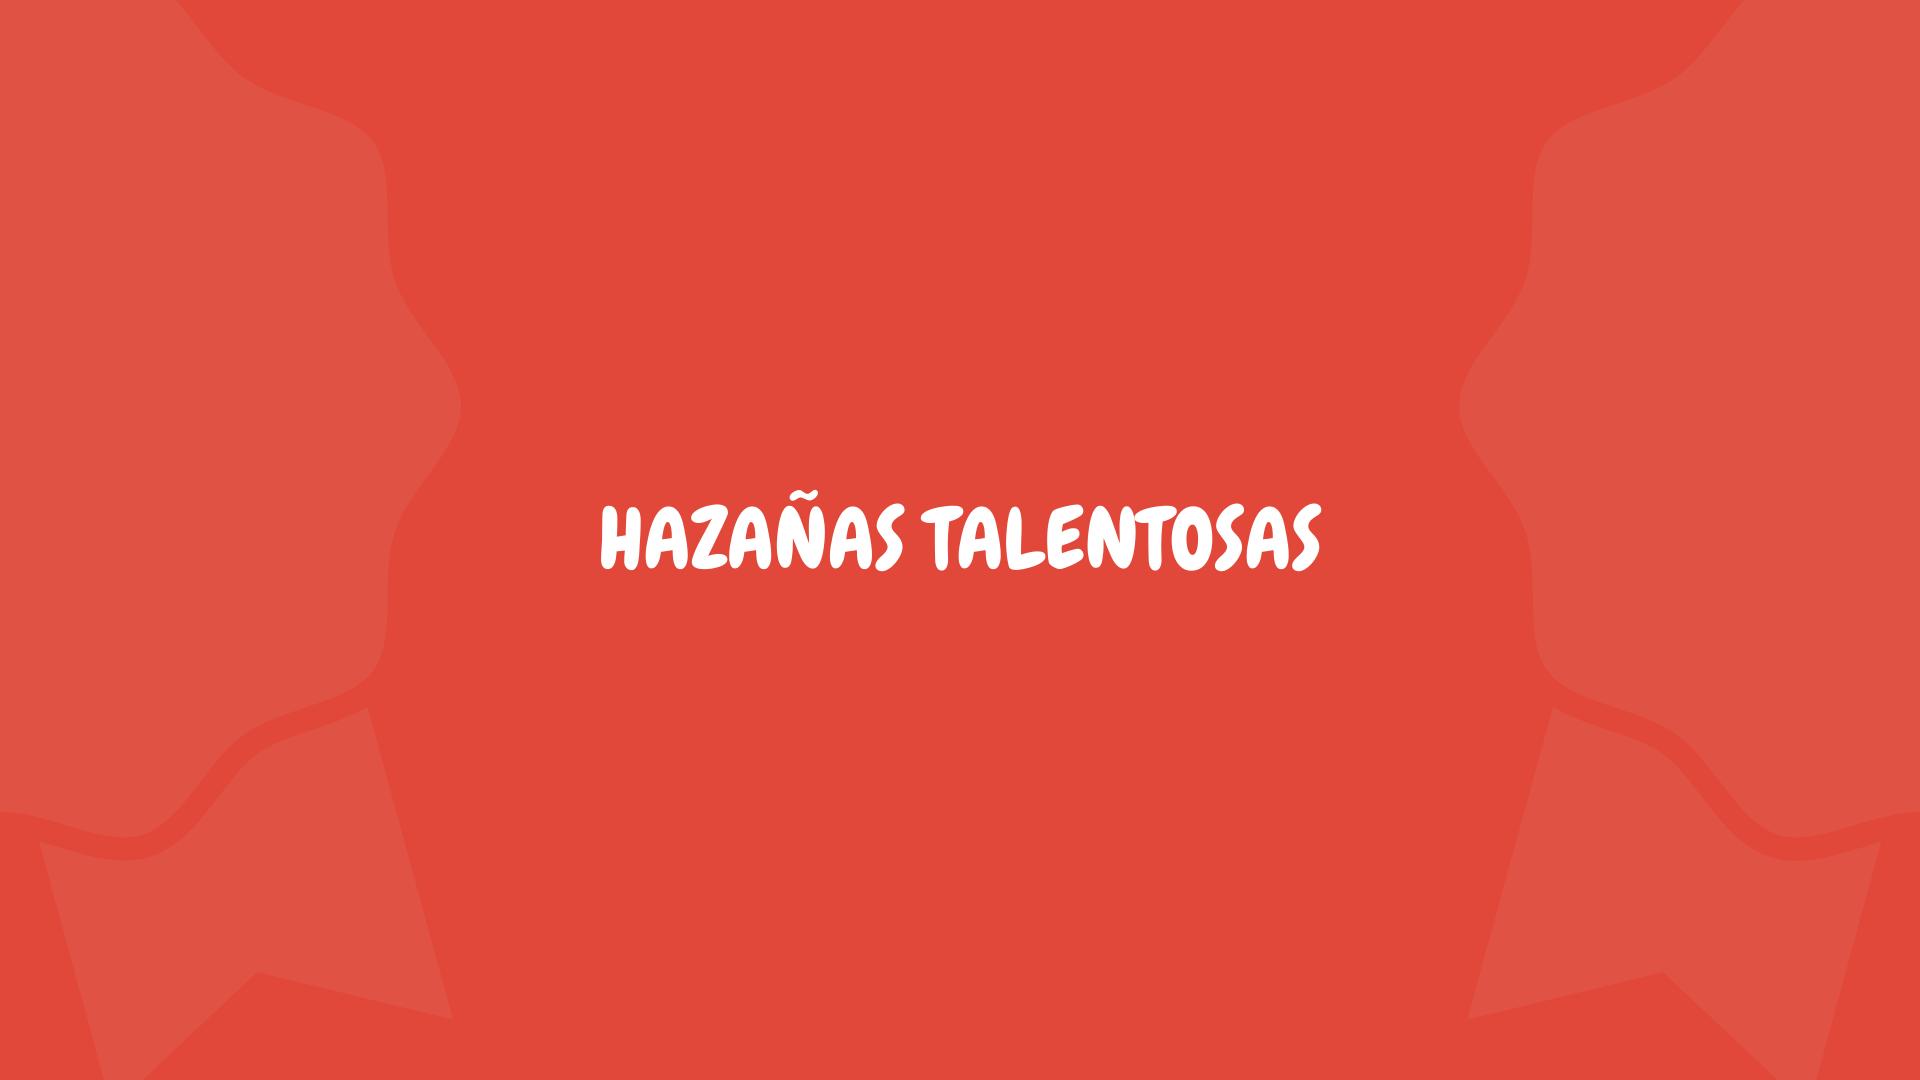 Boletín informativo Hazañas Talentosas 2